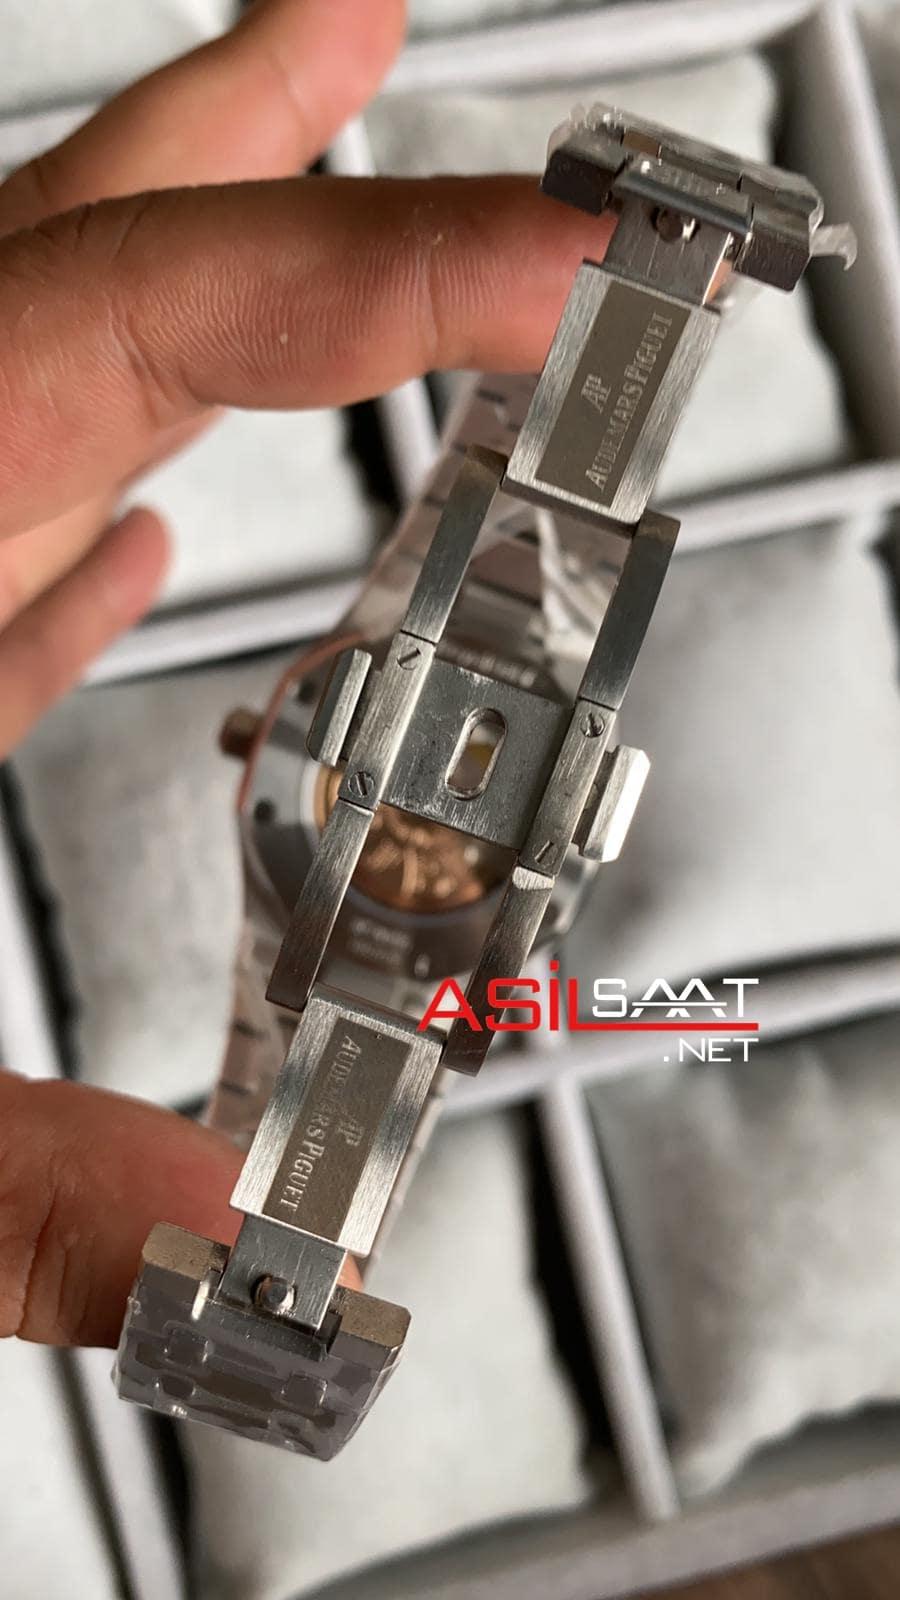 Audemars Piguet Royal Oak Replika Saat APR051